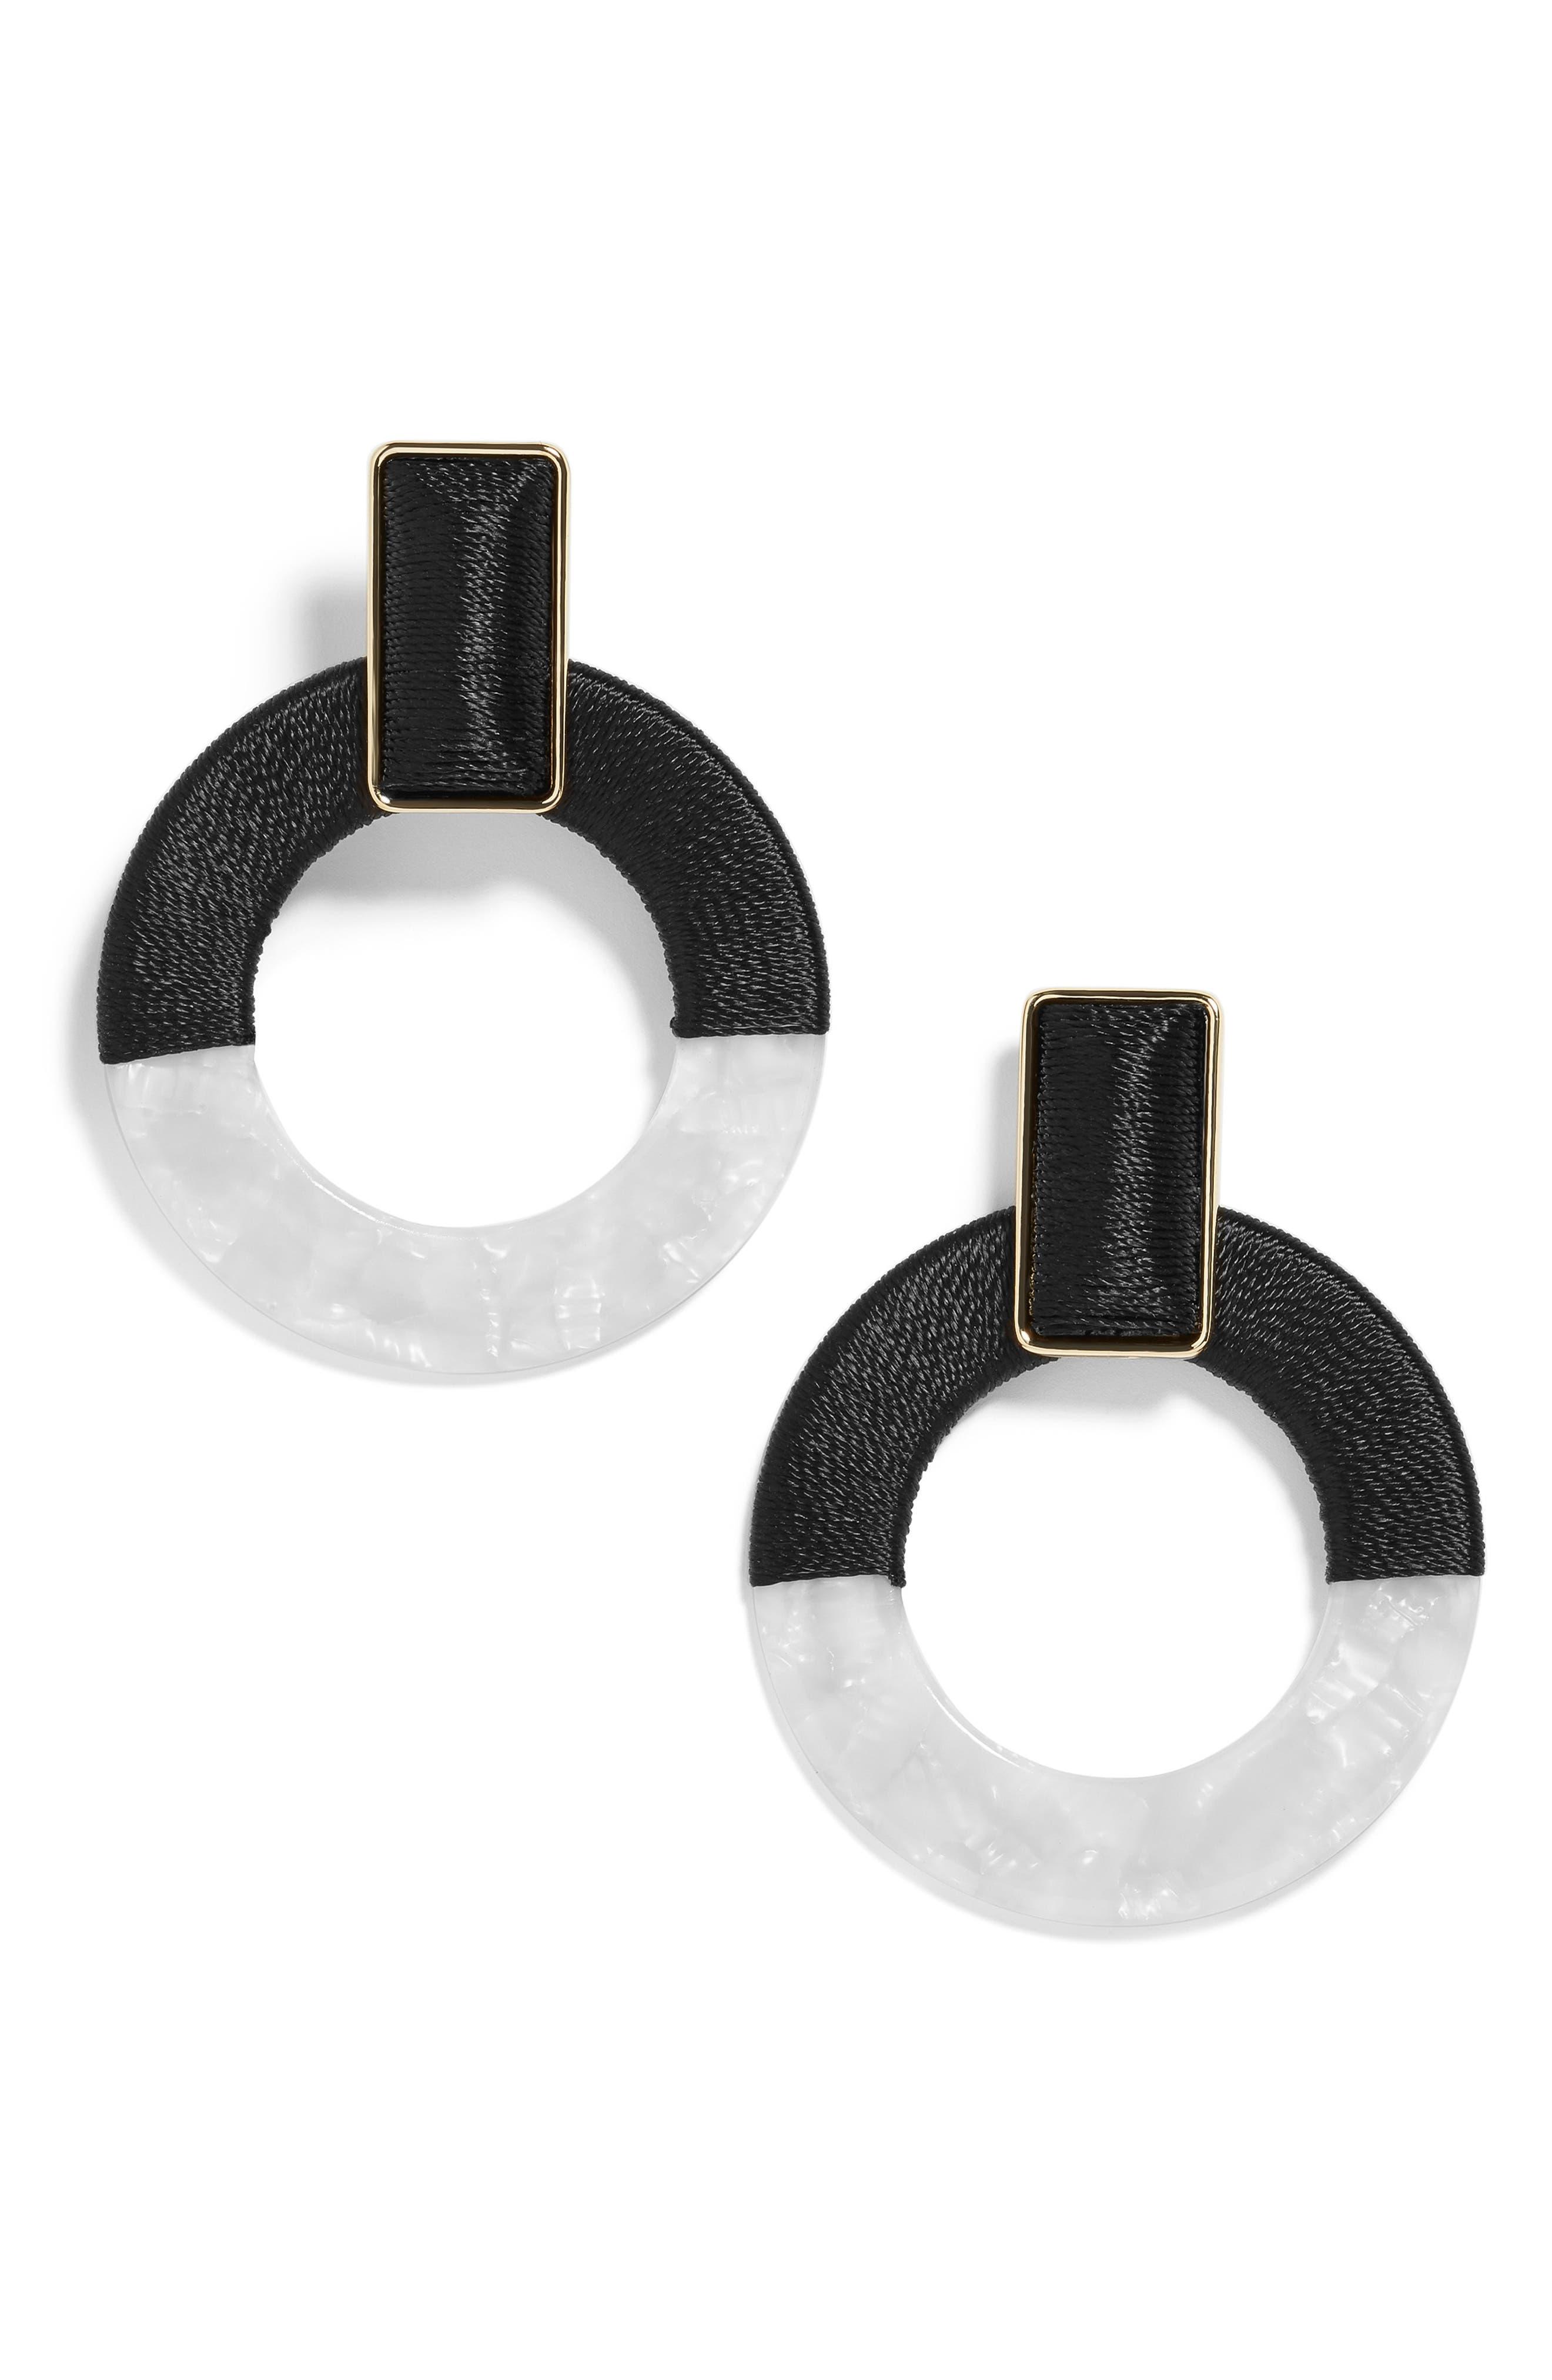 BAUBLEBAR, Emelda Two Tone Circle Drop Earrings, Main thumbnail 1, color, BLACK/ WHITE